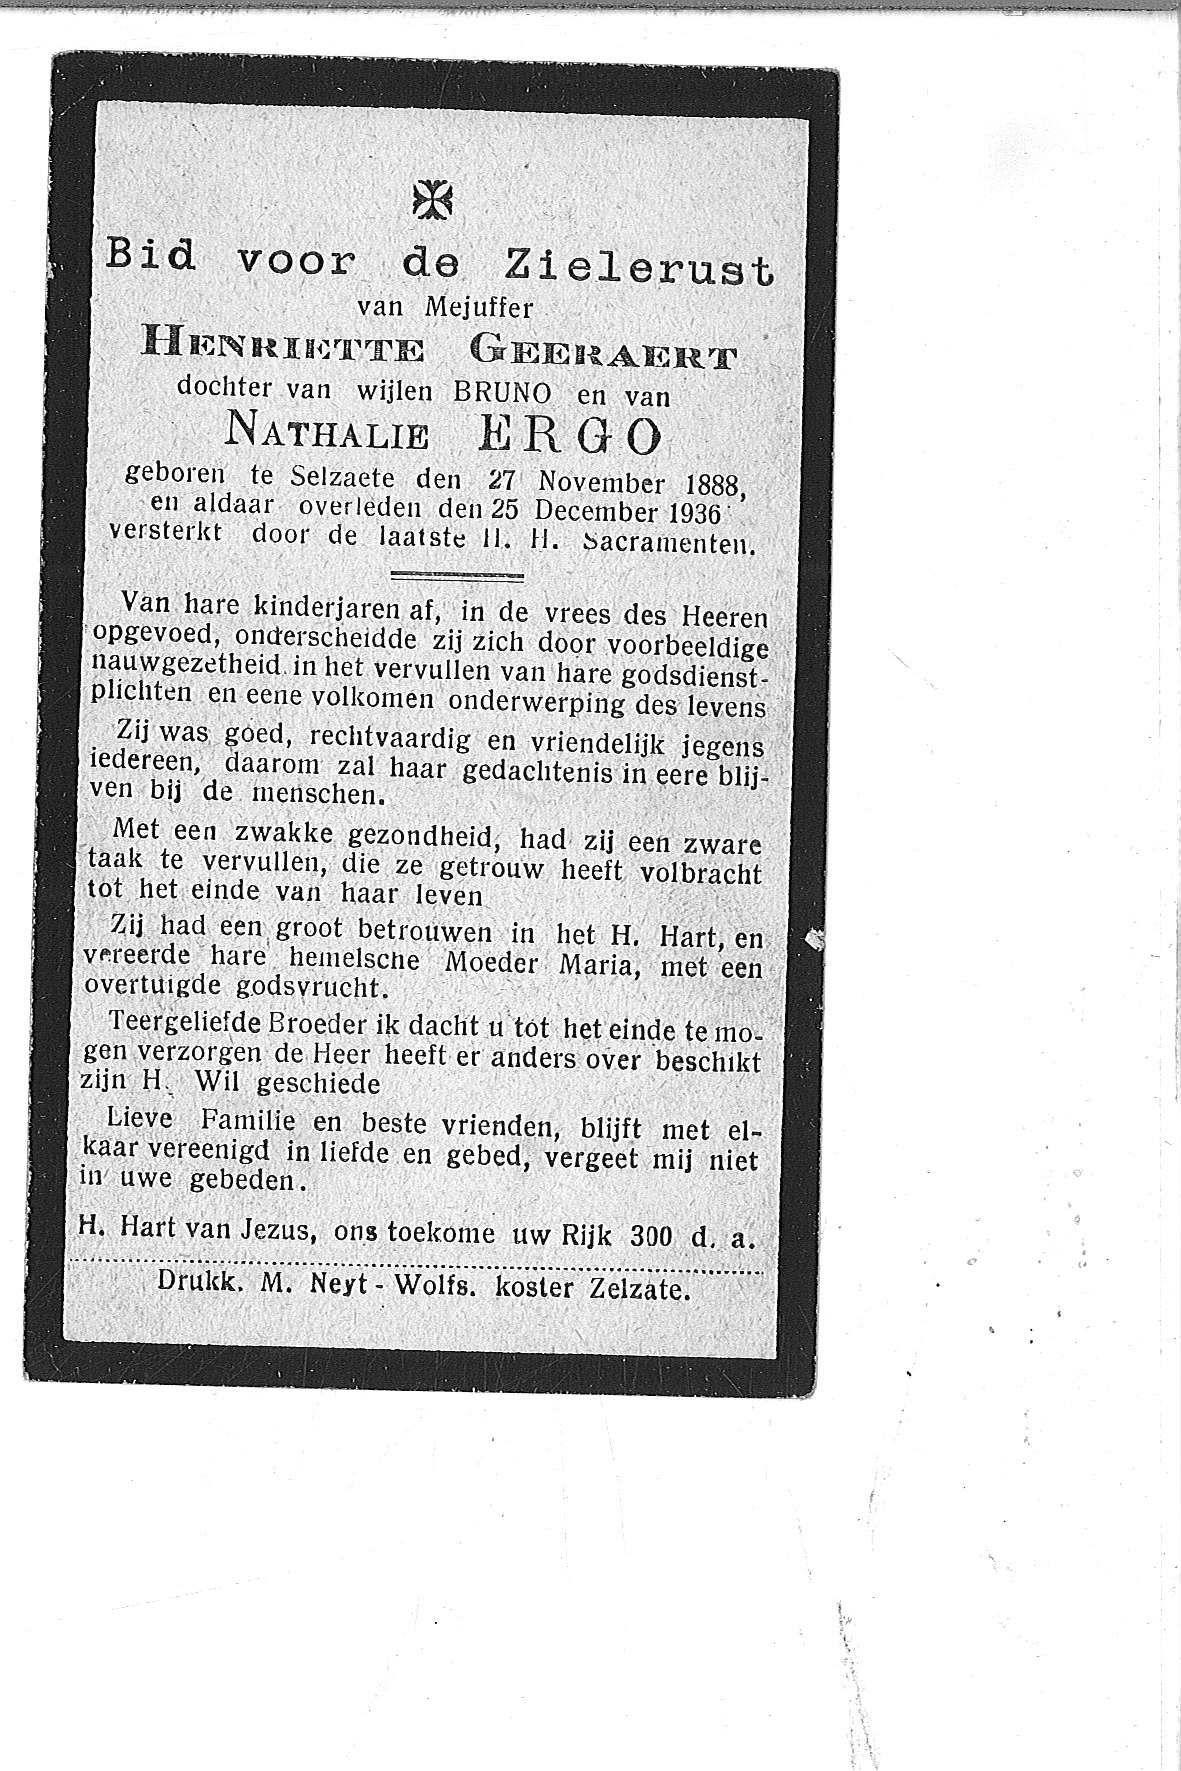 Henriette(1936)20130604133153_00033.jpg